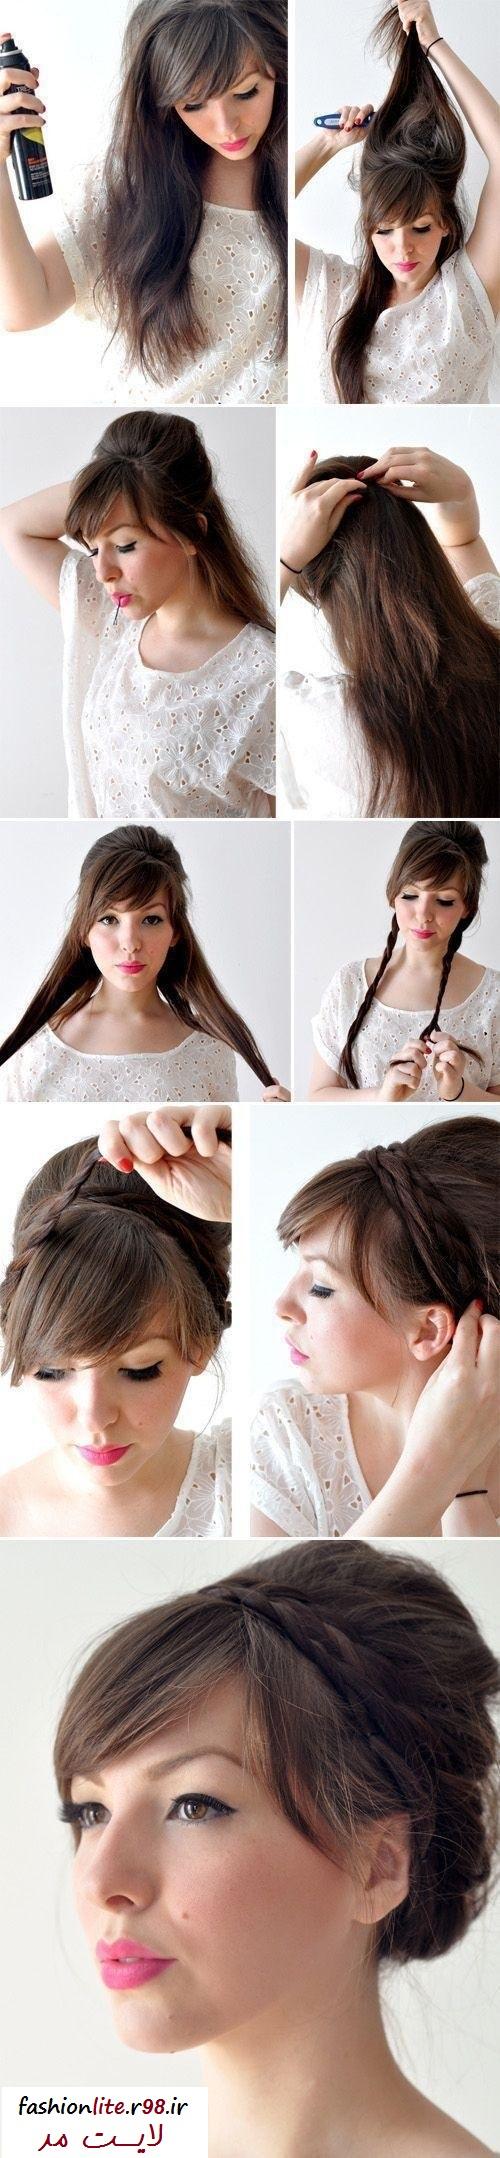 http://rozup.ir/up/litemode/Pictures/mode30/fashionlite.r98.ir3.jpg